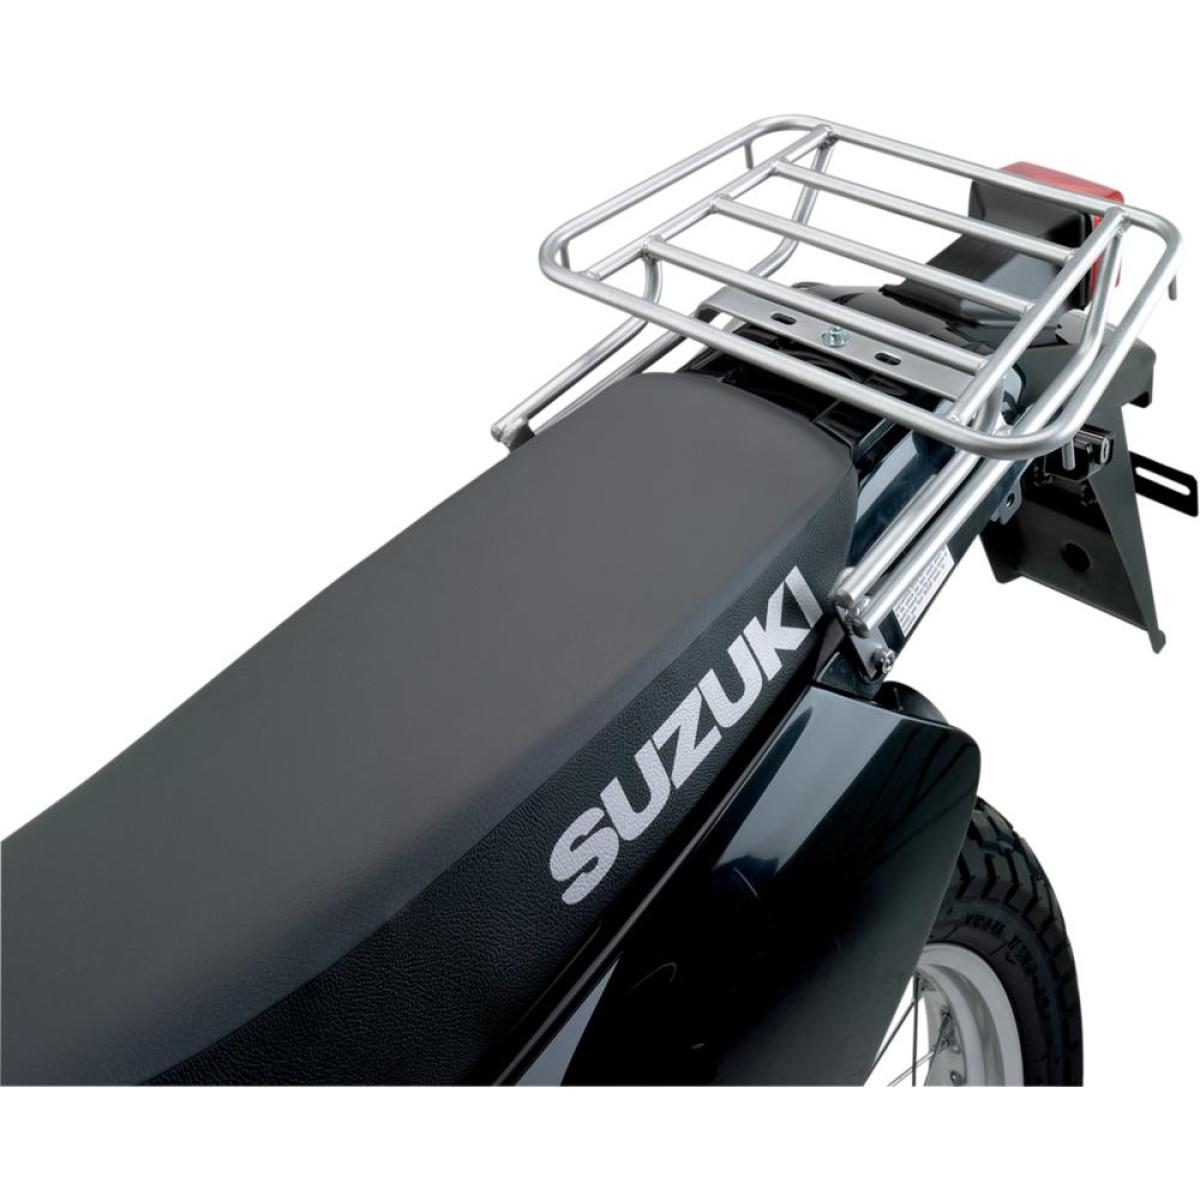 Багажник на мотоцикл Suzuki DR650SE 96-11